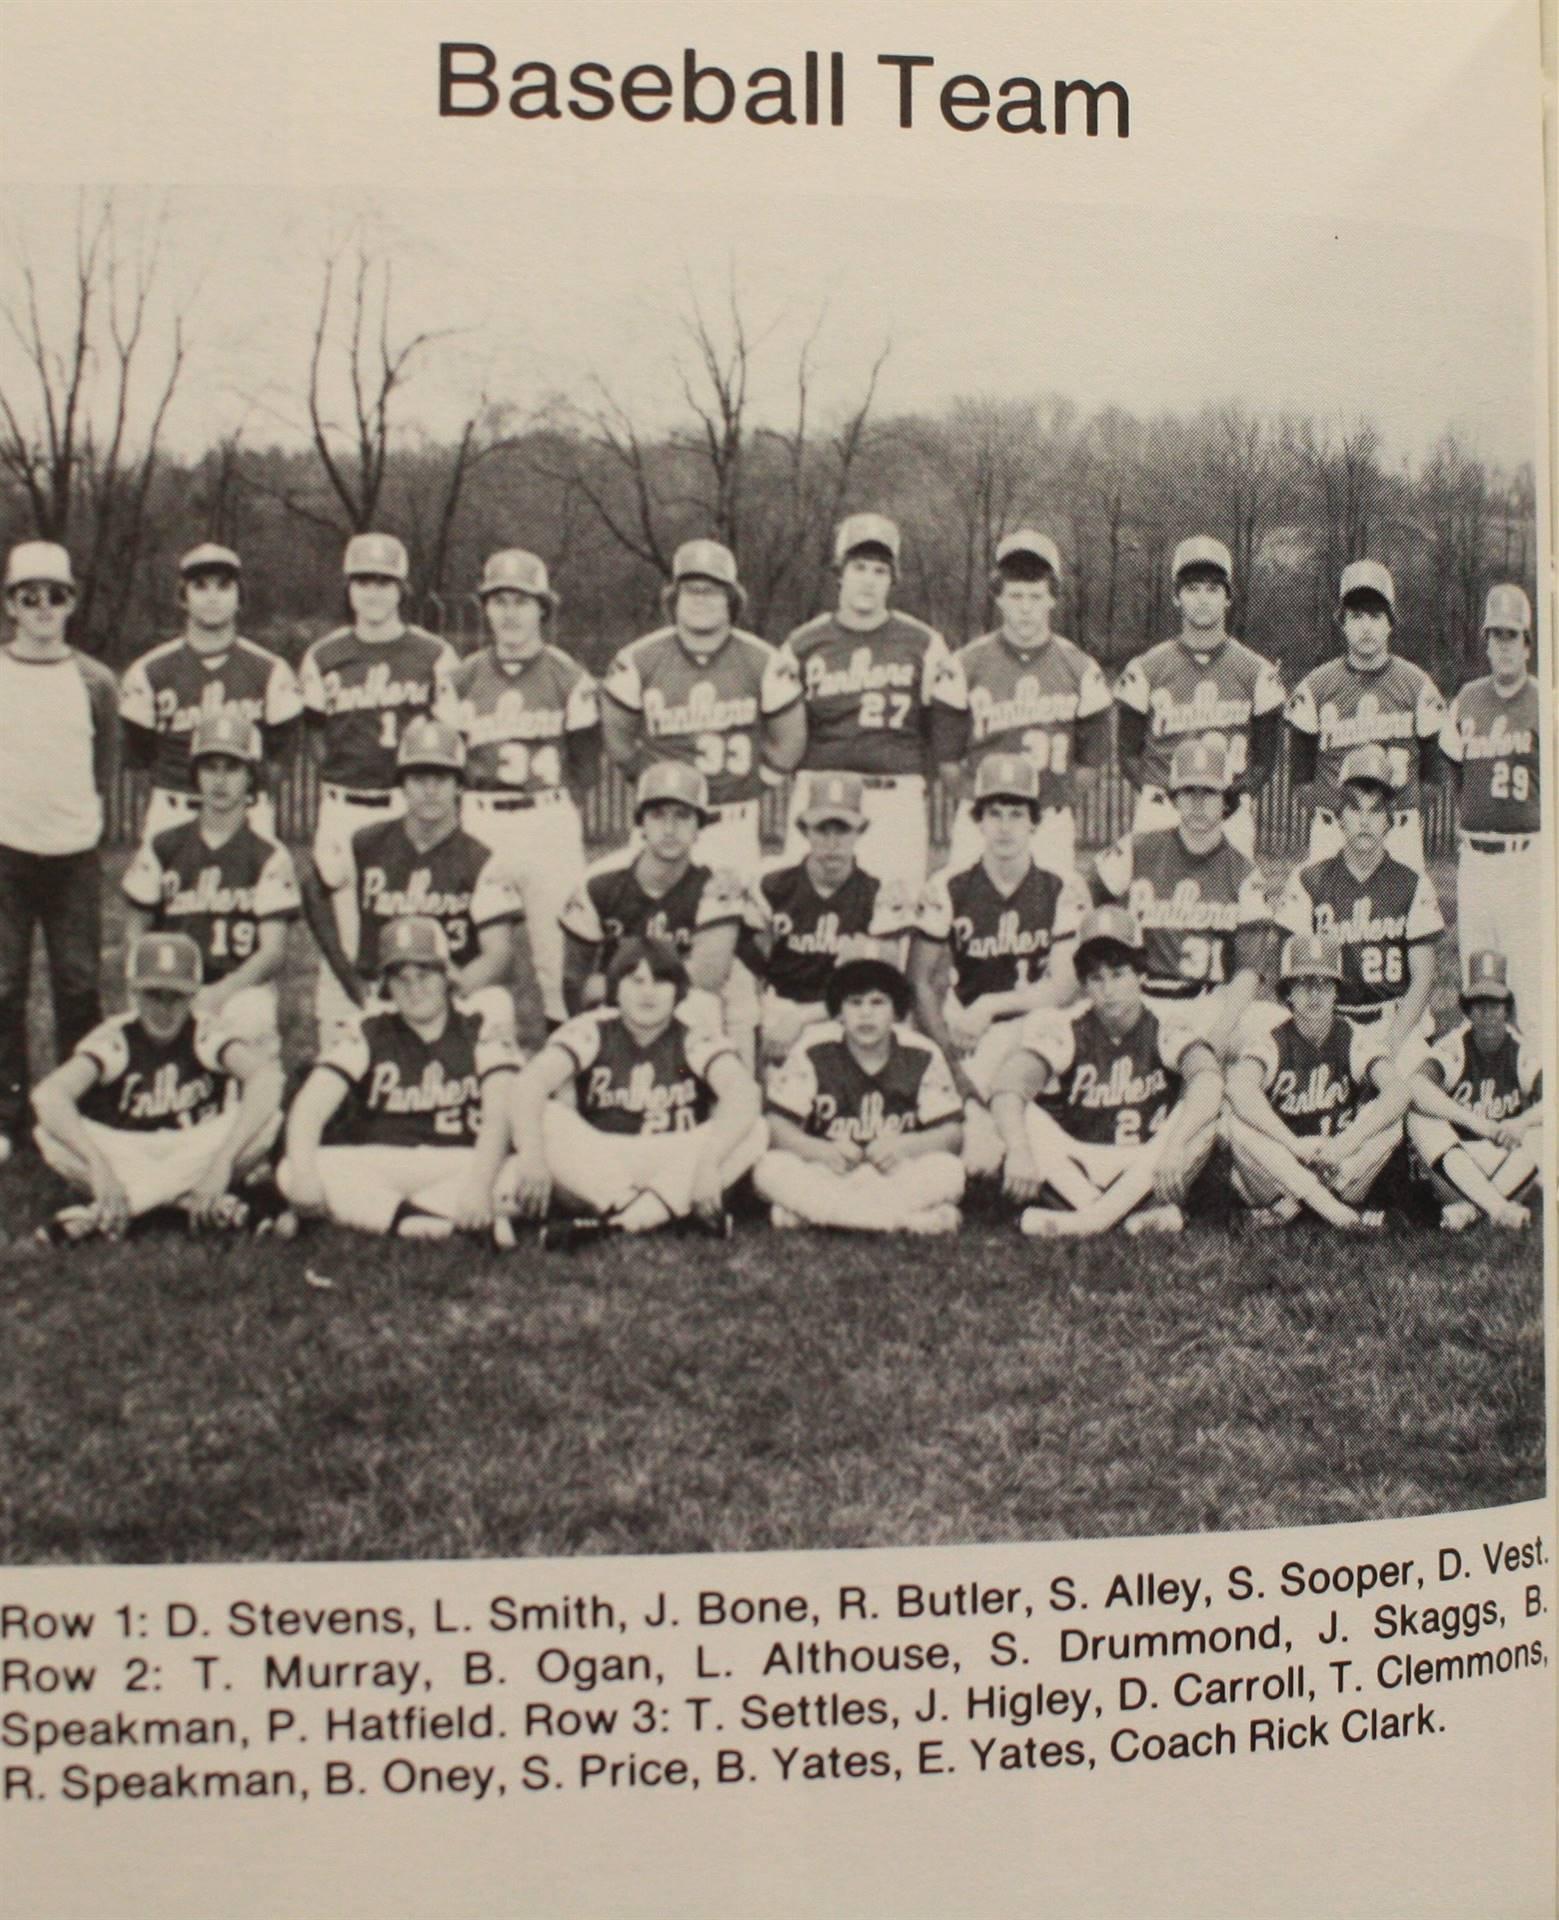 1982 Baseball Team